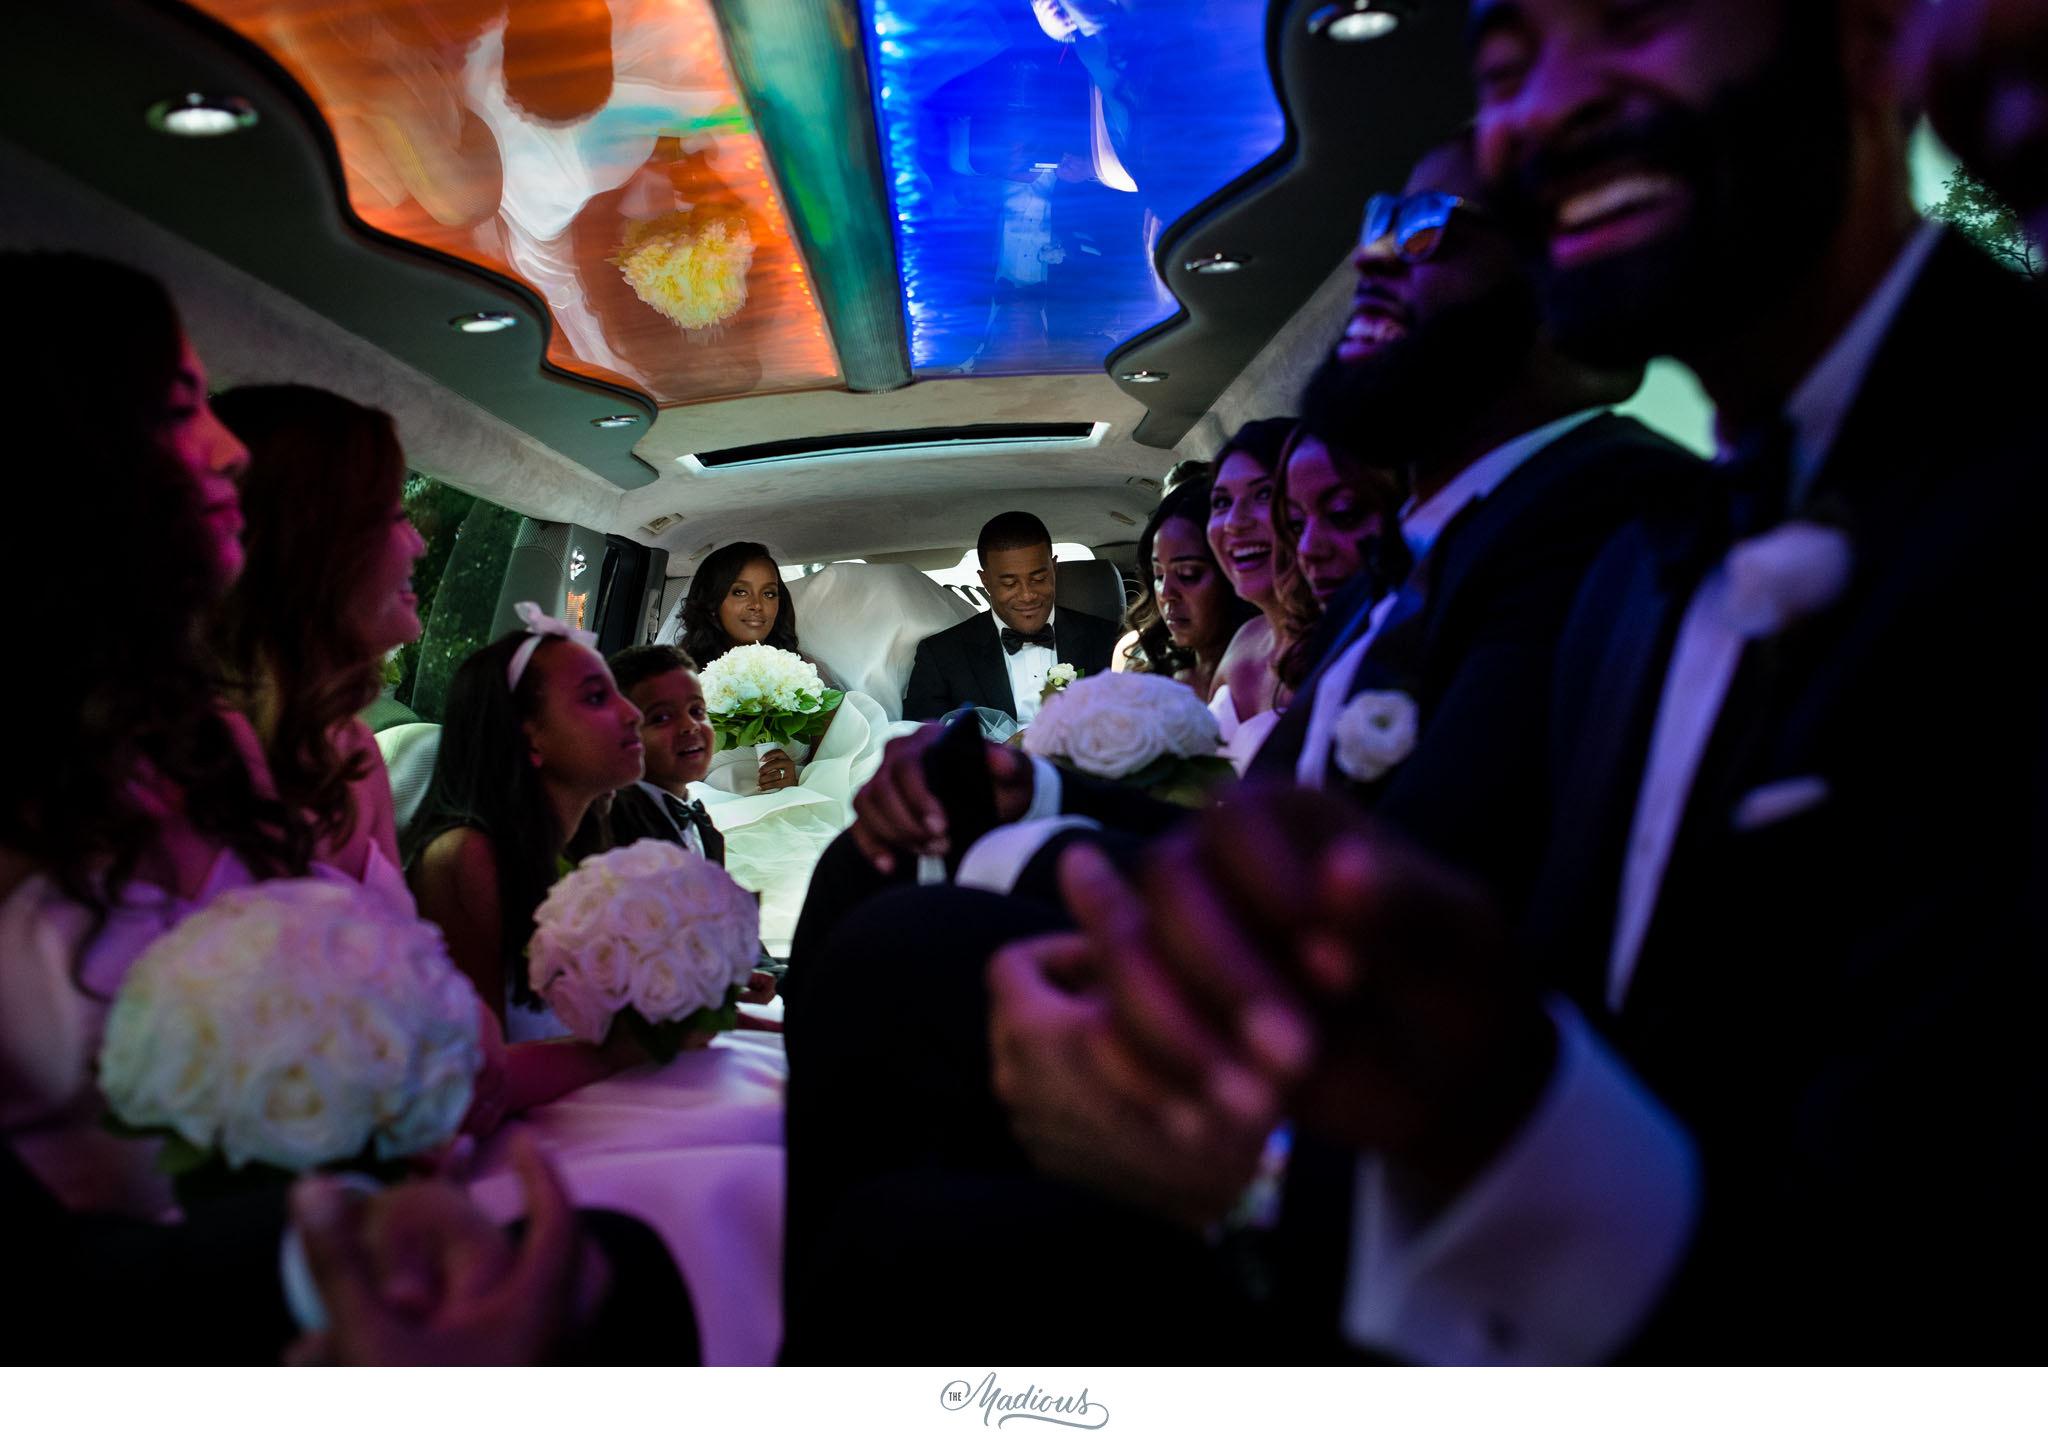 nmwa+wedding,+women+in+the+arts+wedding,+ethiopian+wedding,+dc+wedding+0057.jpg